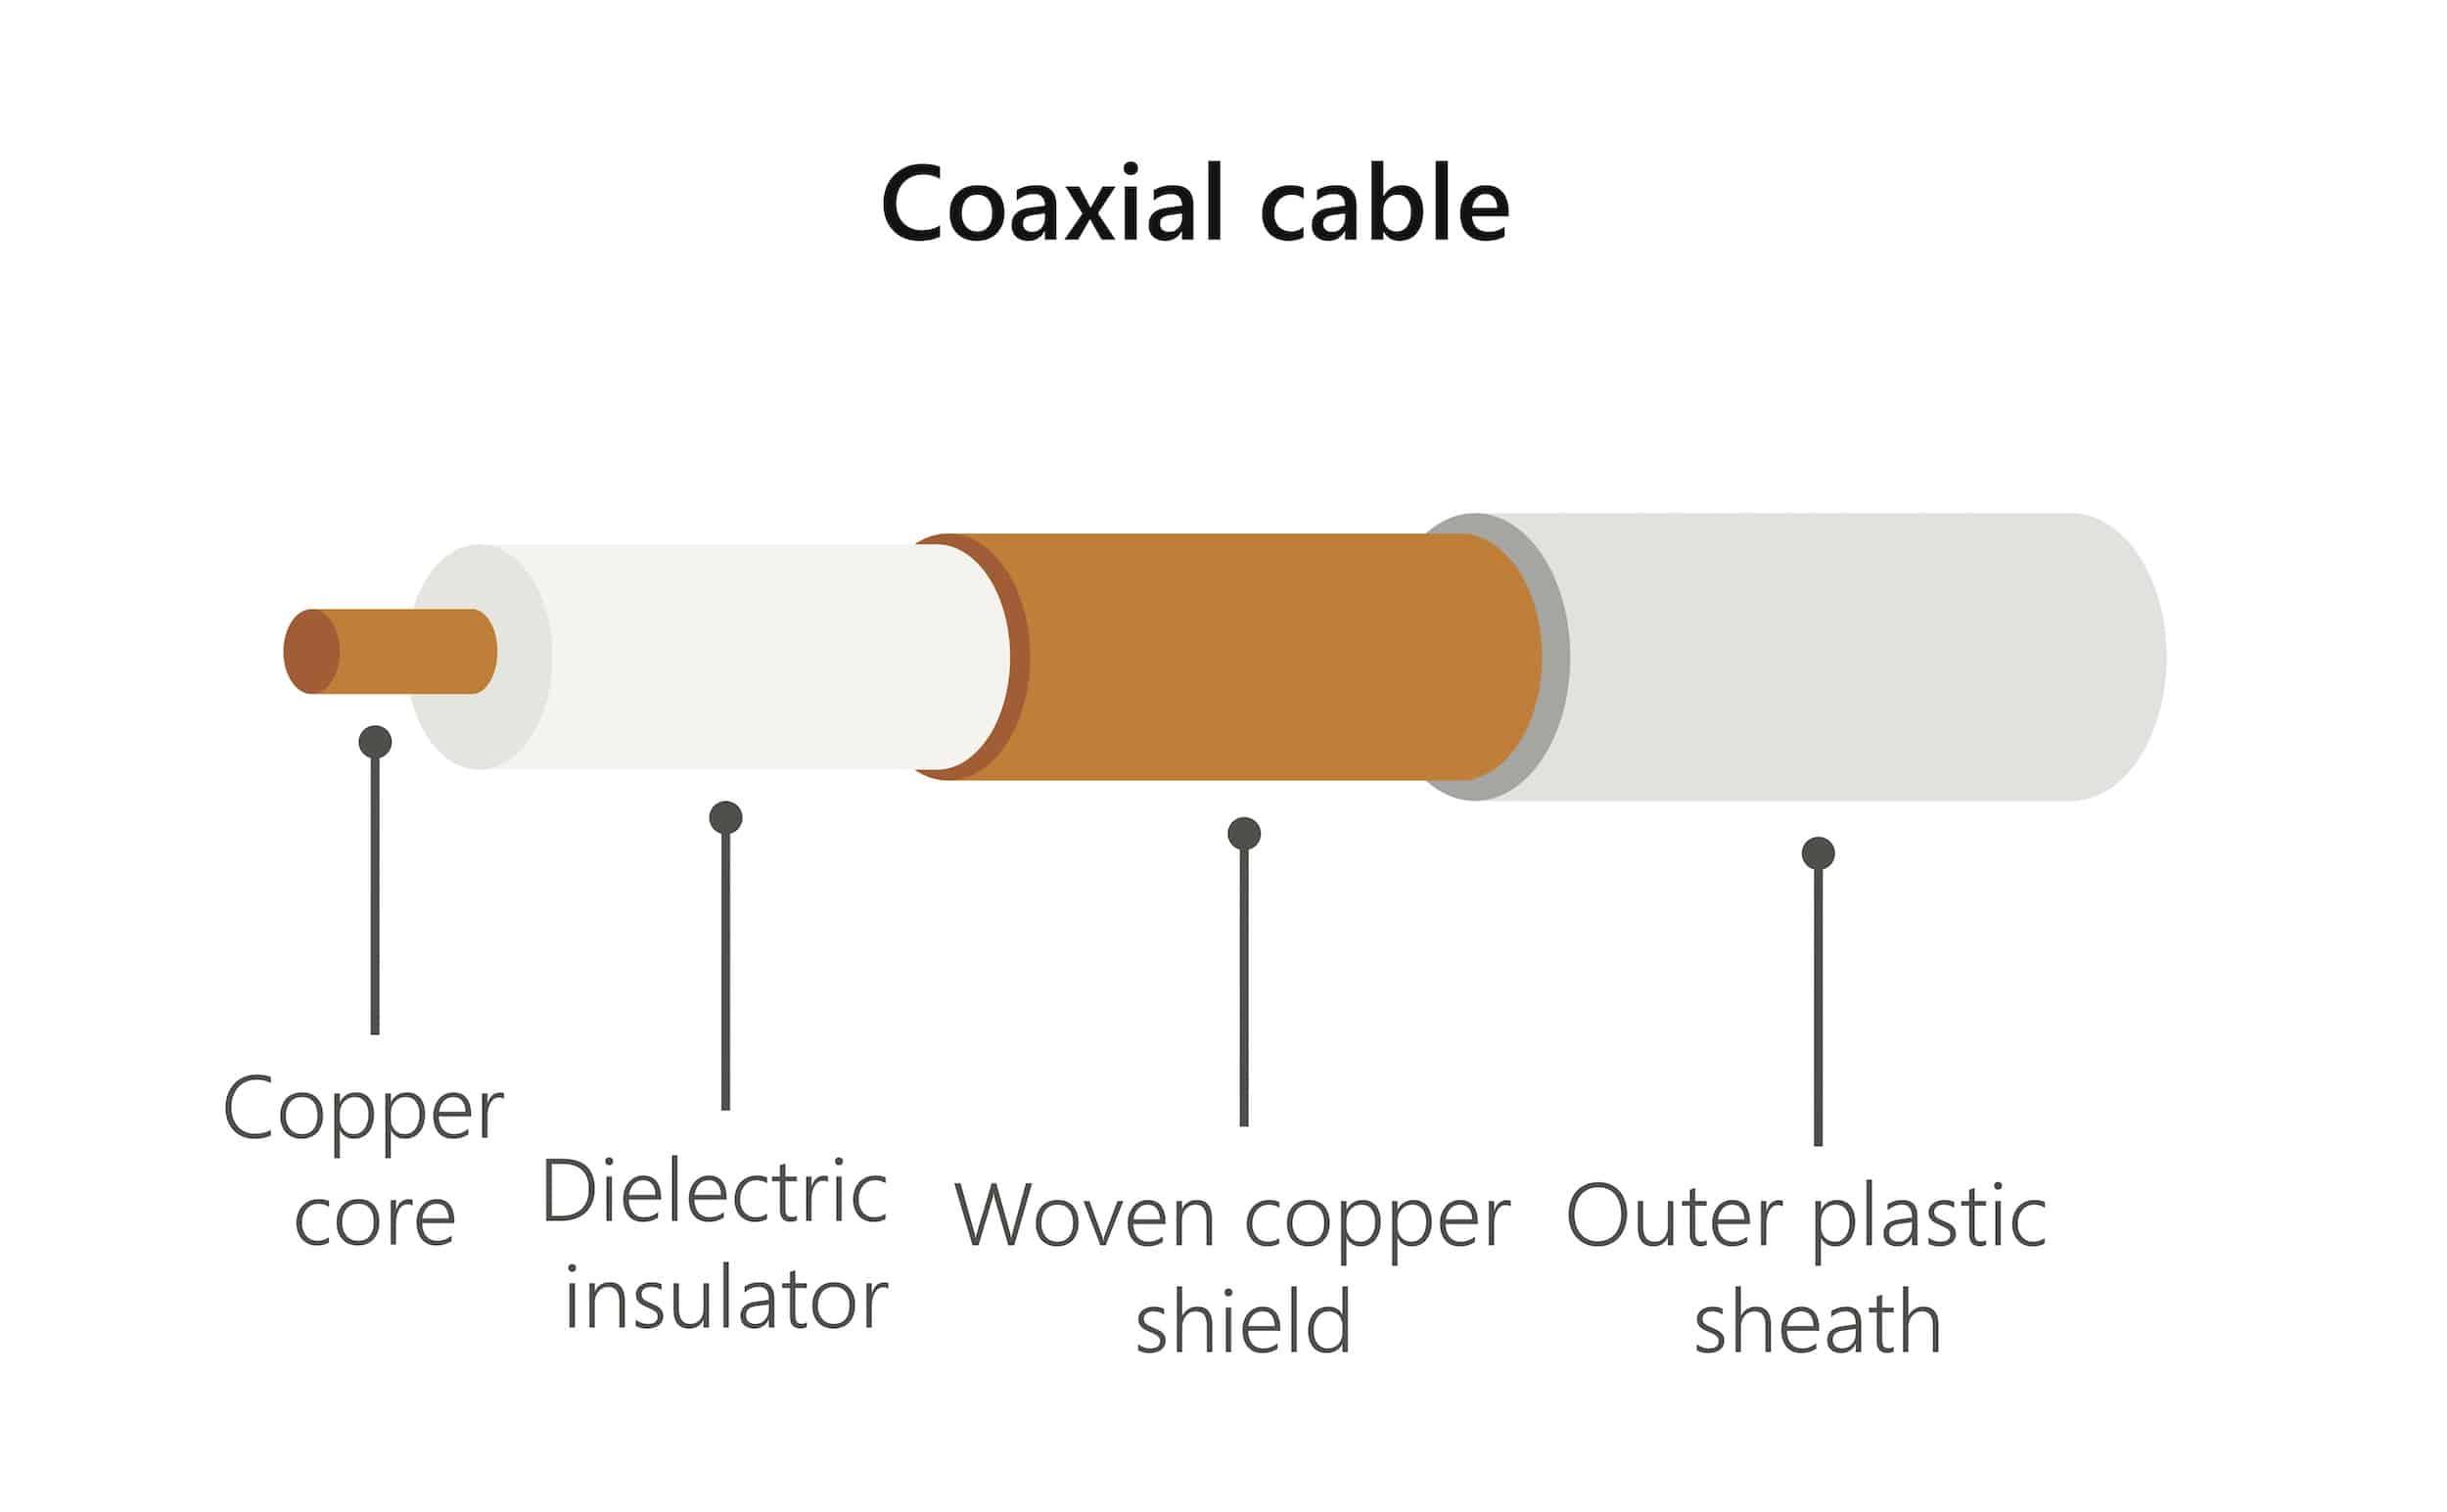 Coaxial cable diagram